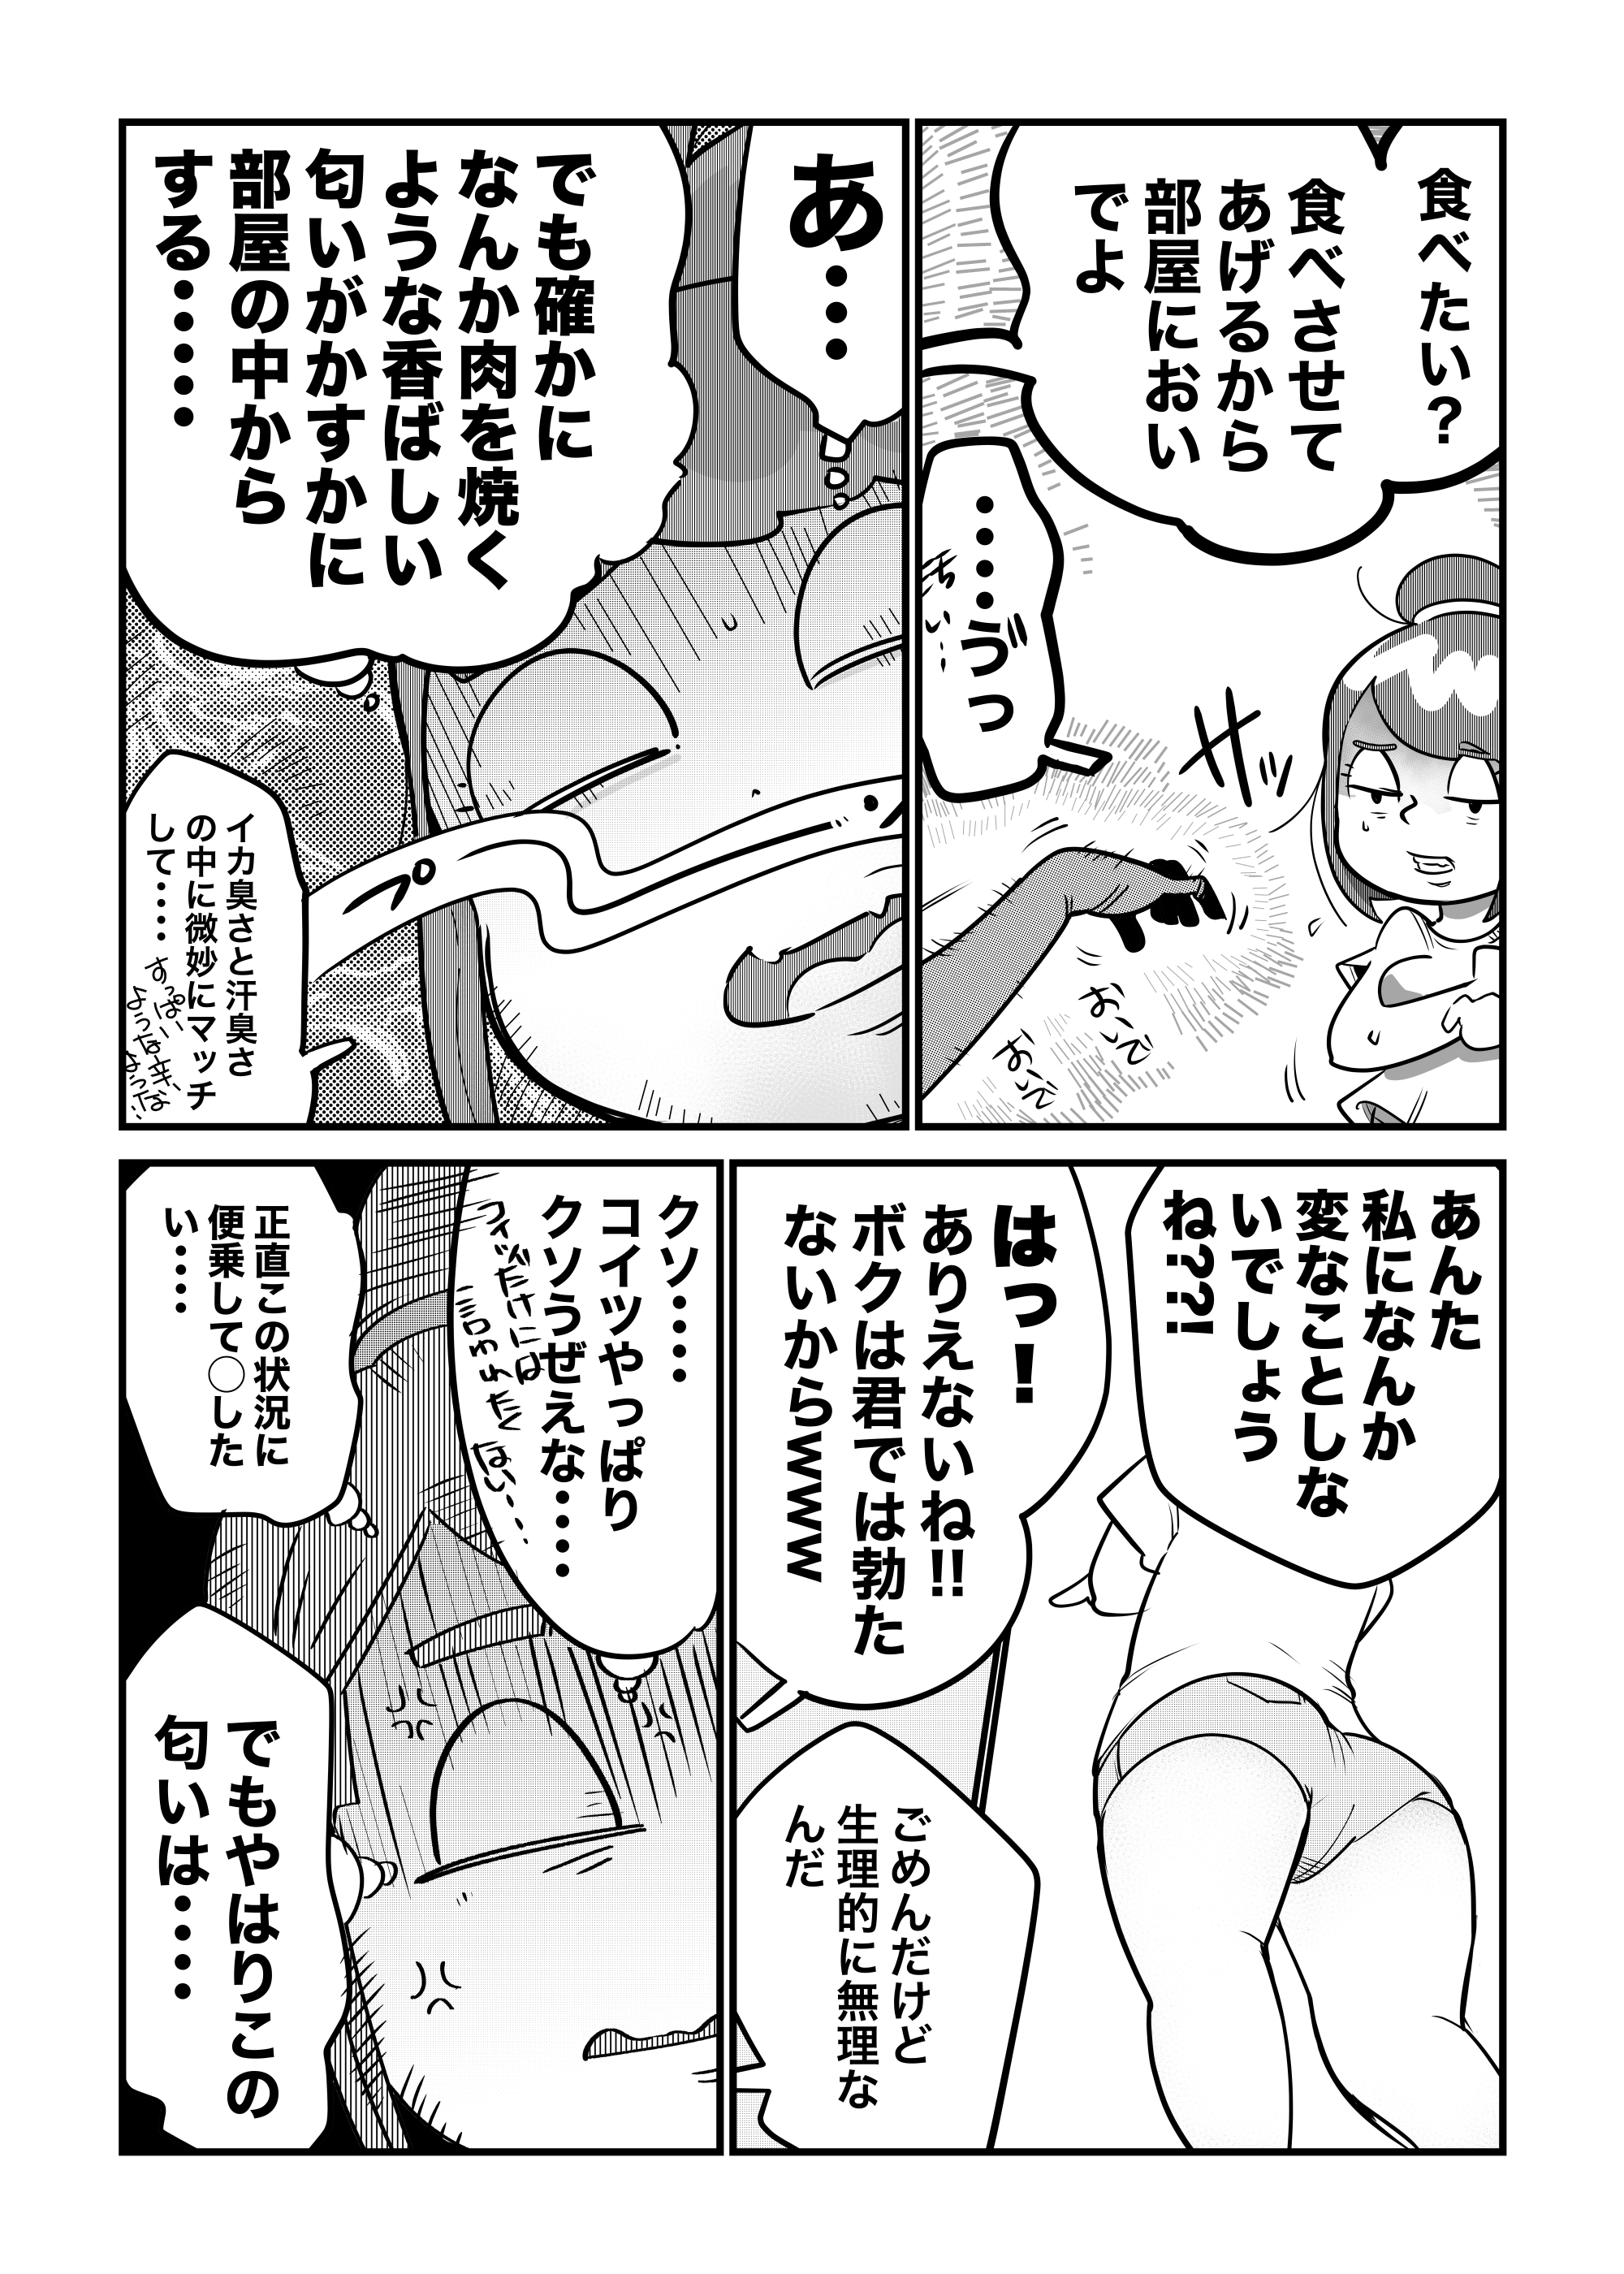 f:id:terashimaru117:20210914234658p:plain